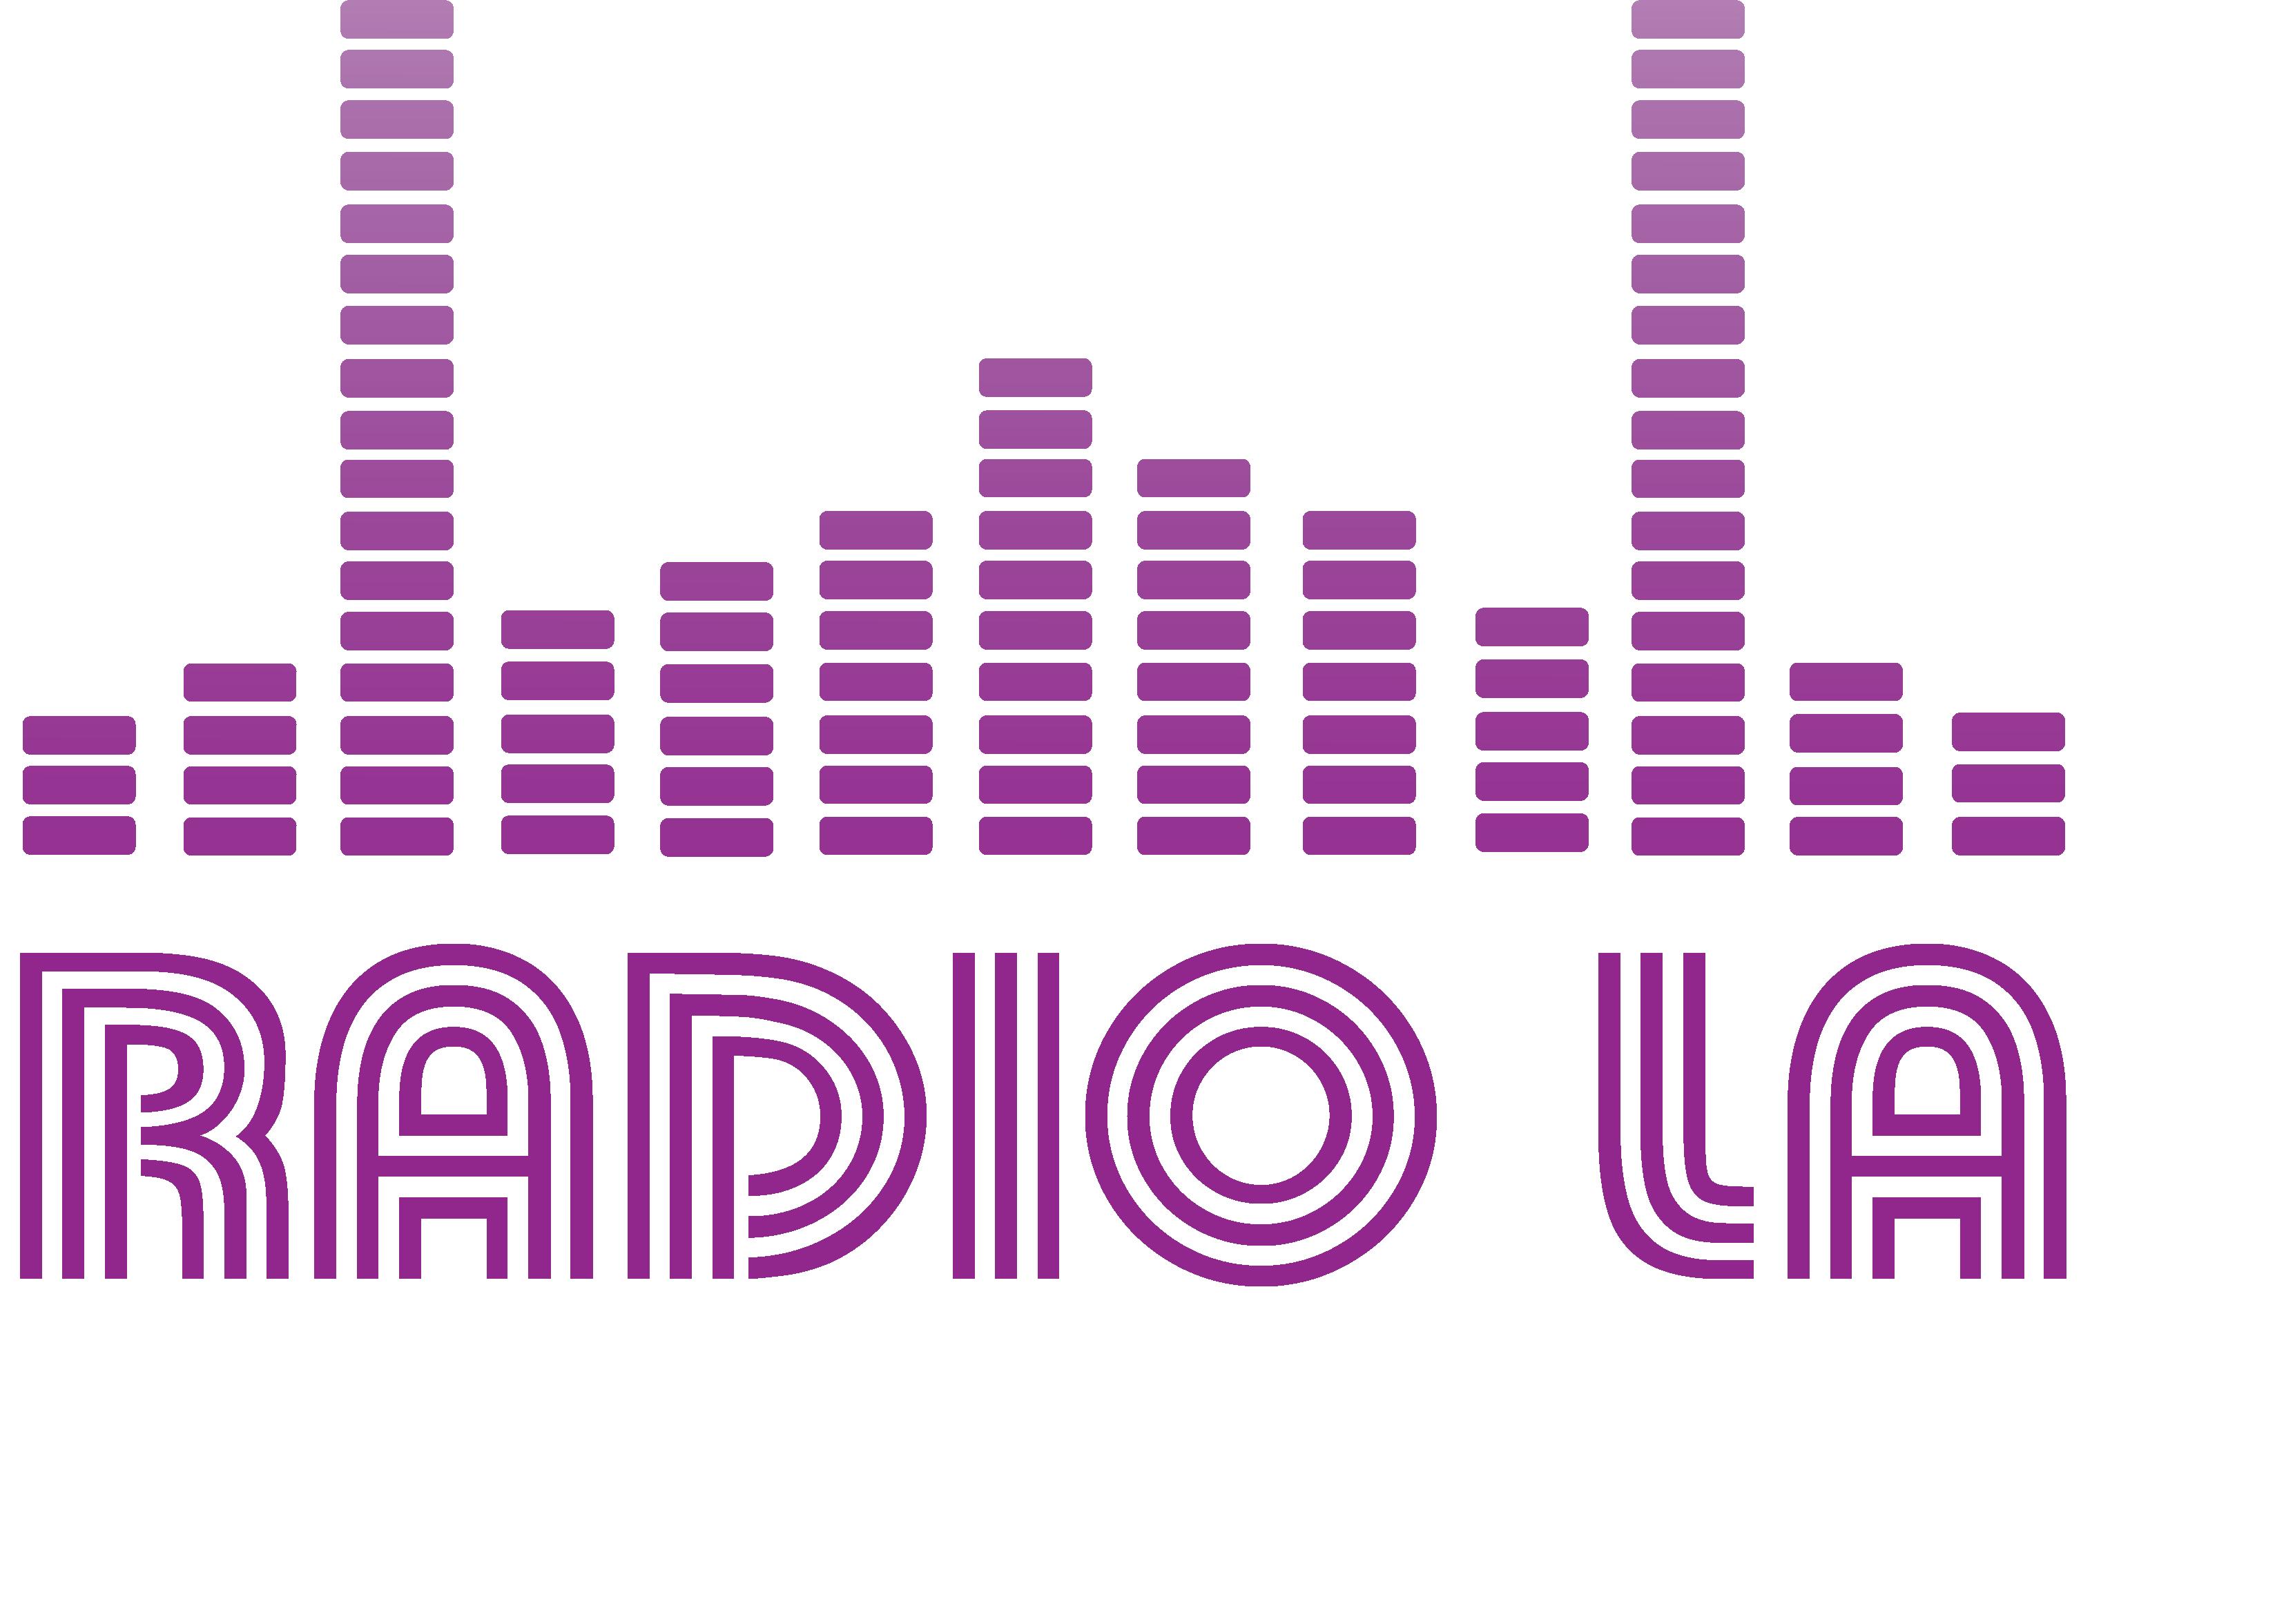 Radio La Candela